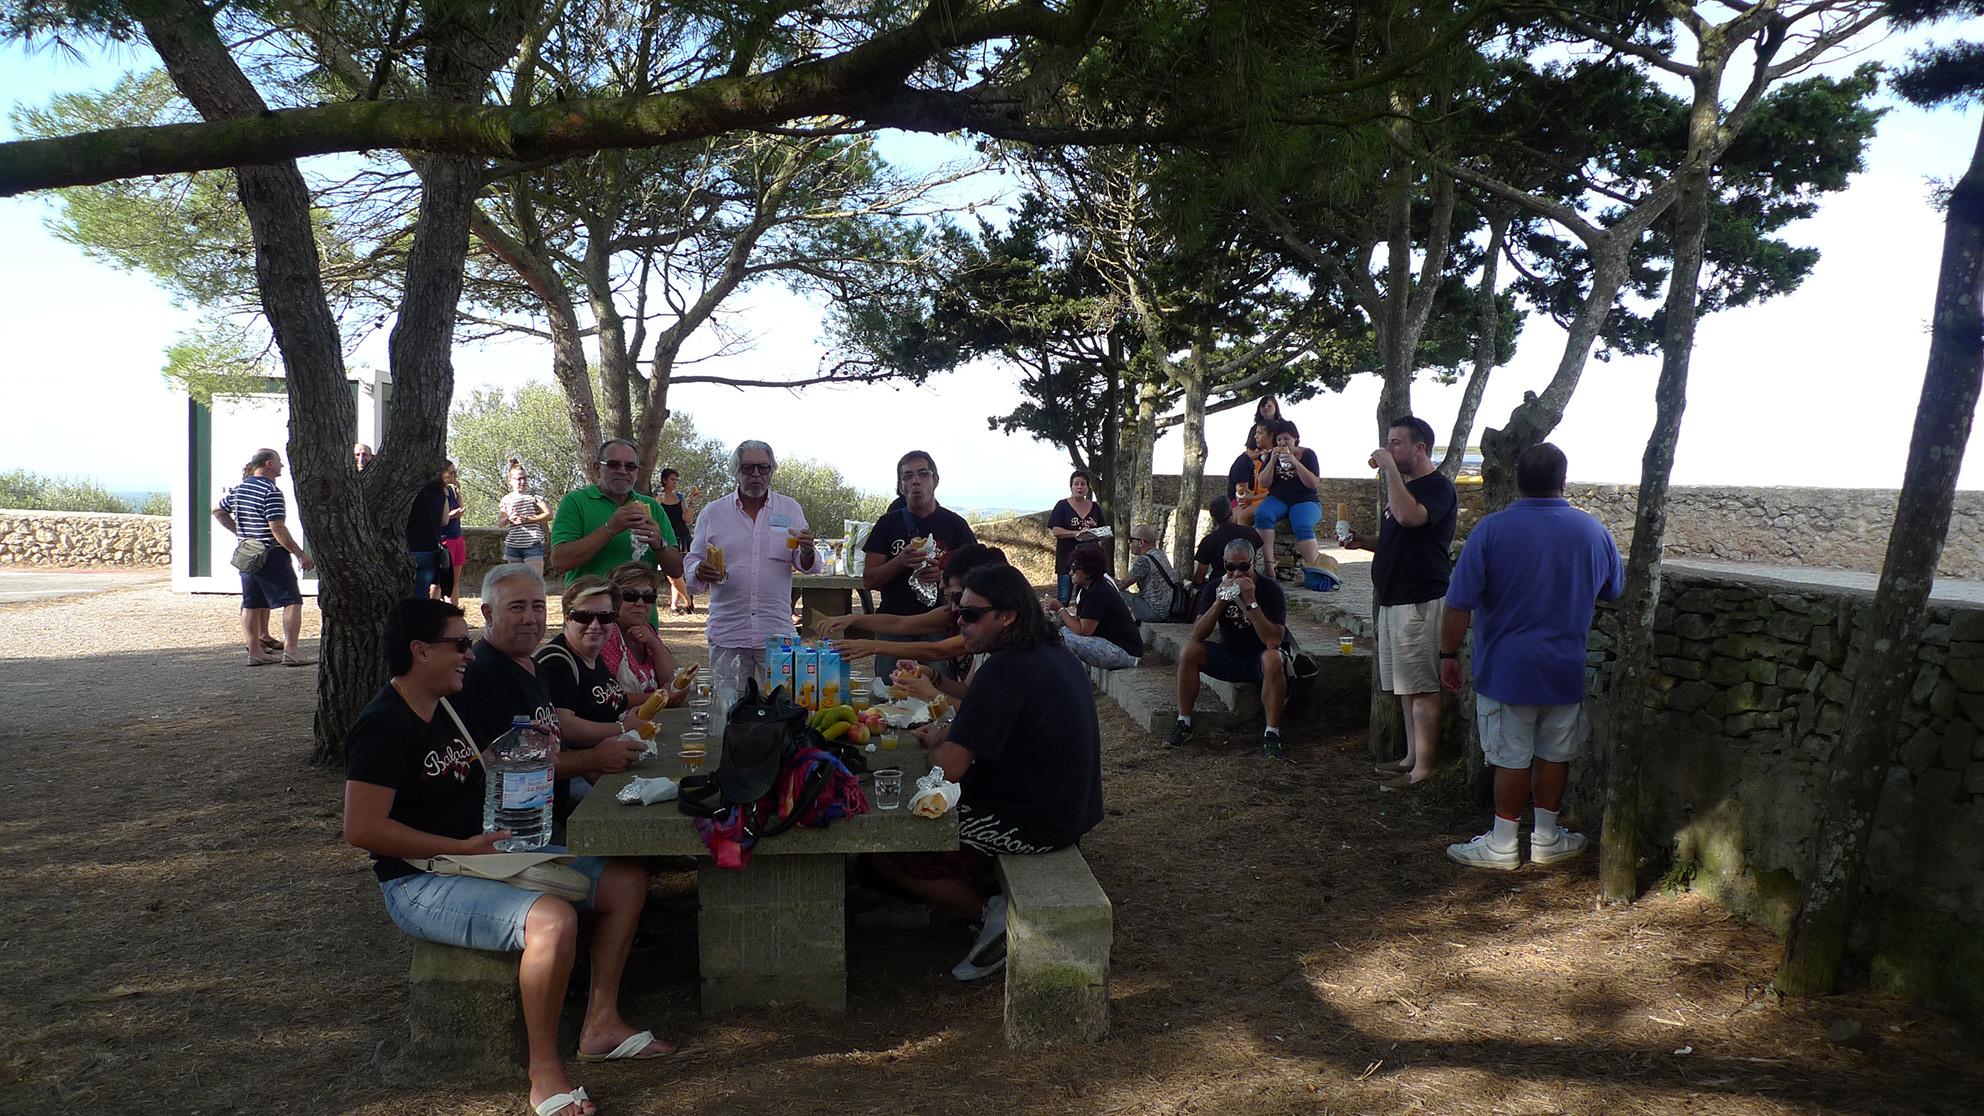 2014-08-15al17 BALADRE a Ferreries RafCAM (88)